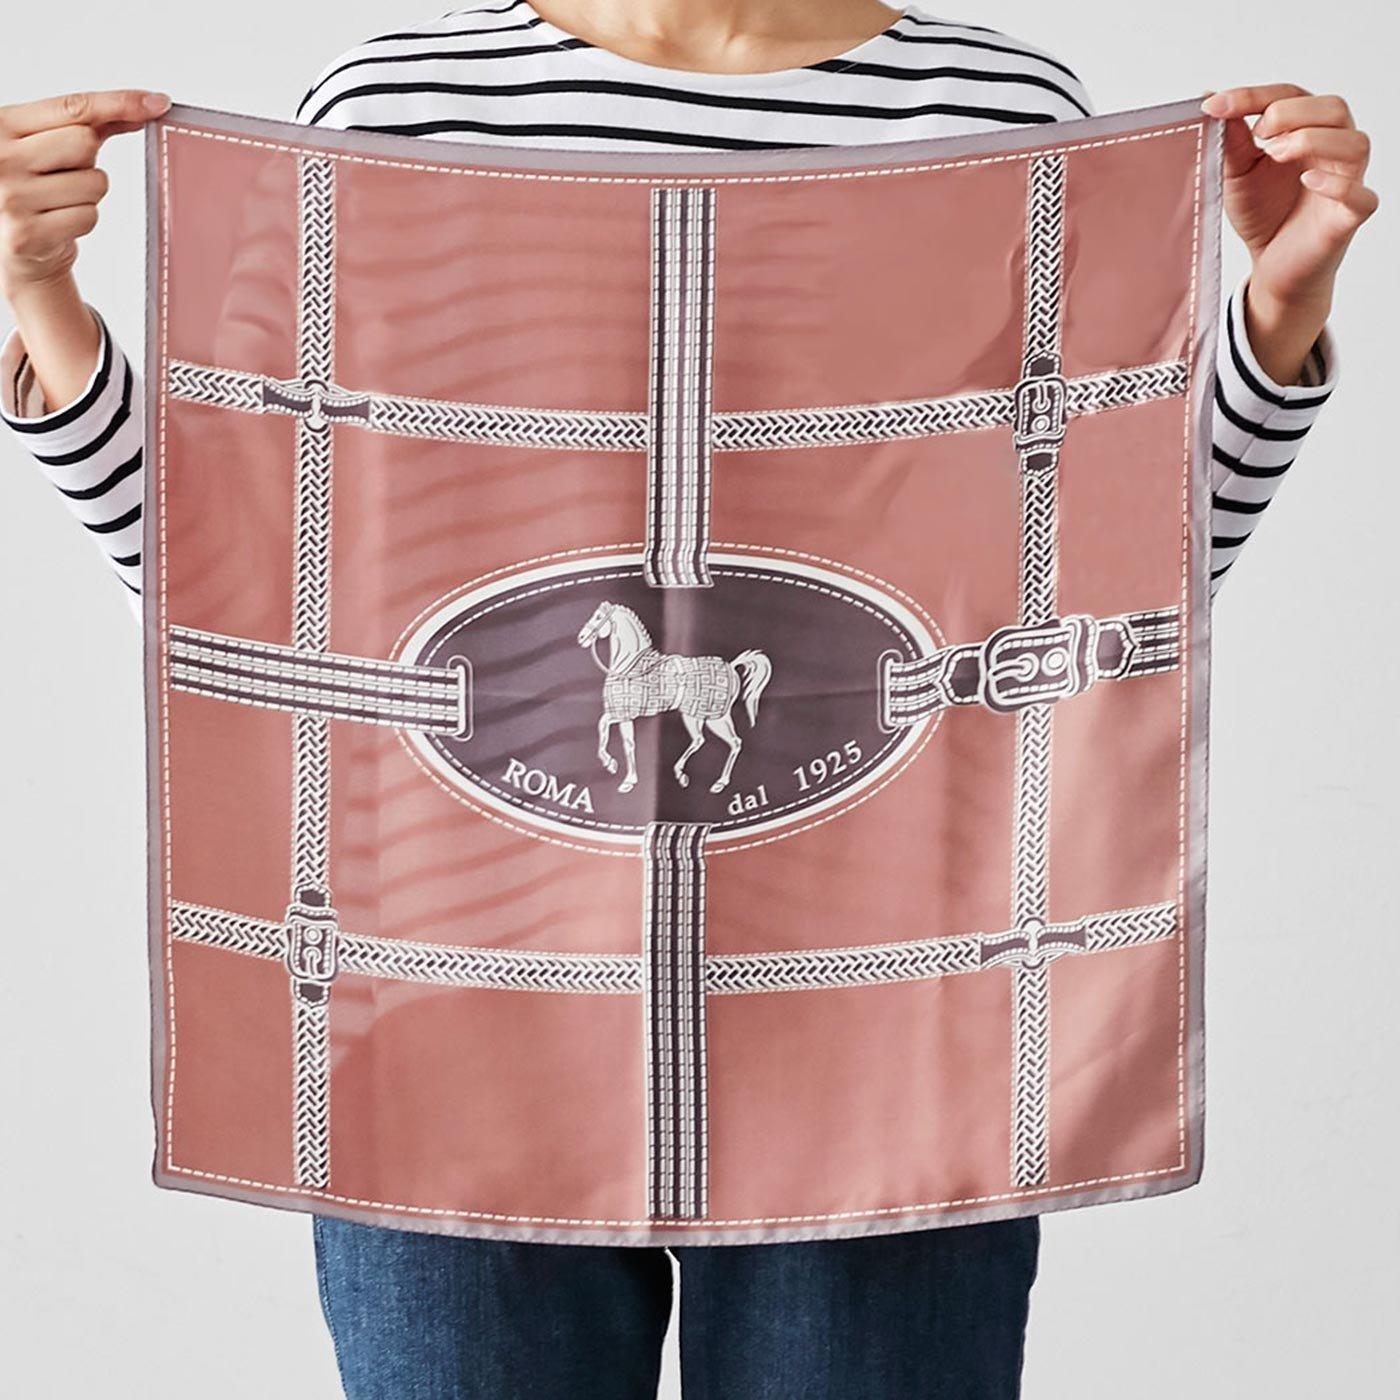 IEDIT[イディット] SELECT 大判遣いでアレンジ自在な馬柄スカーフ〈ピンク〉